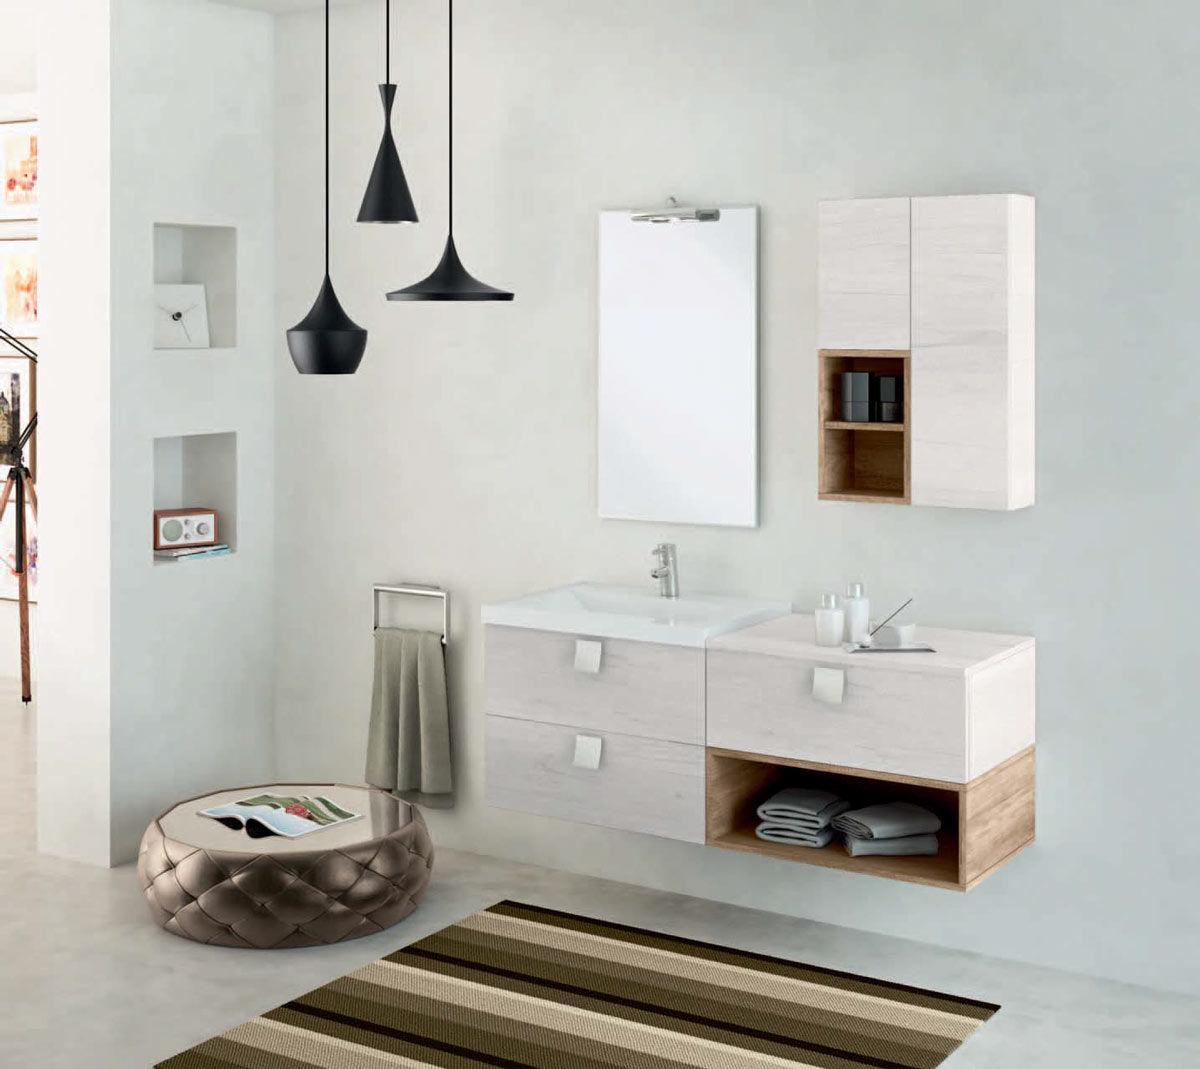 Bagno in muratura moderno cool bagni in muratura elegante for Arredo bagno in muratura